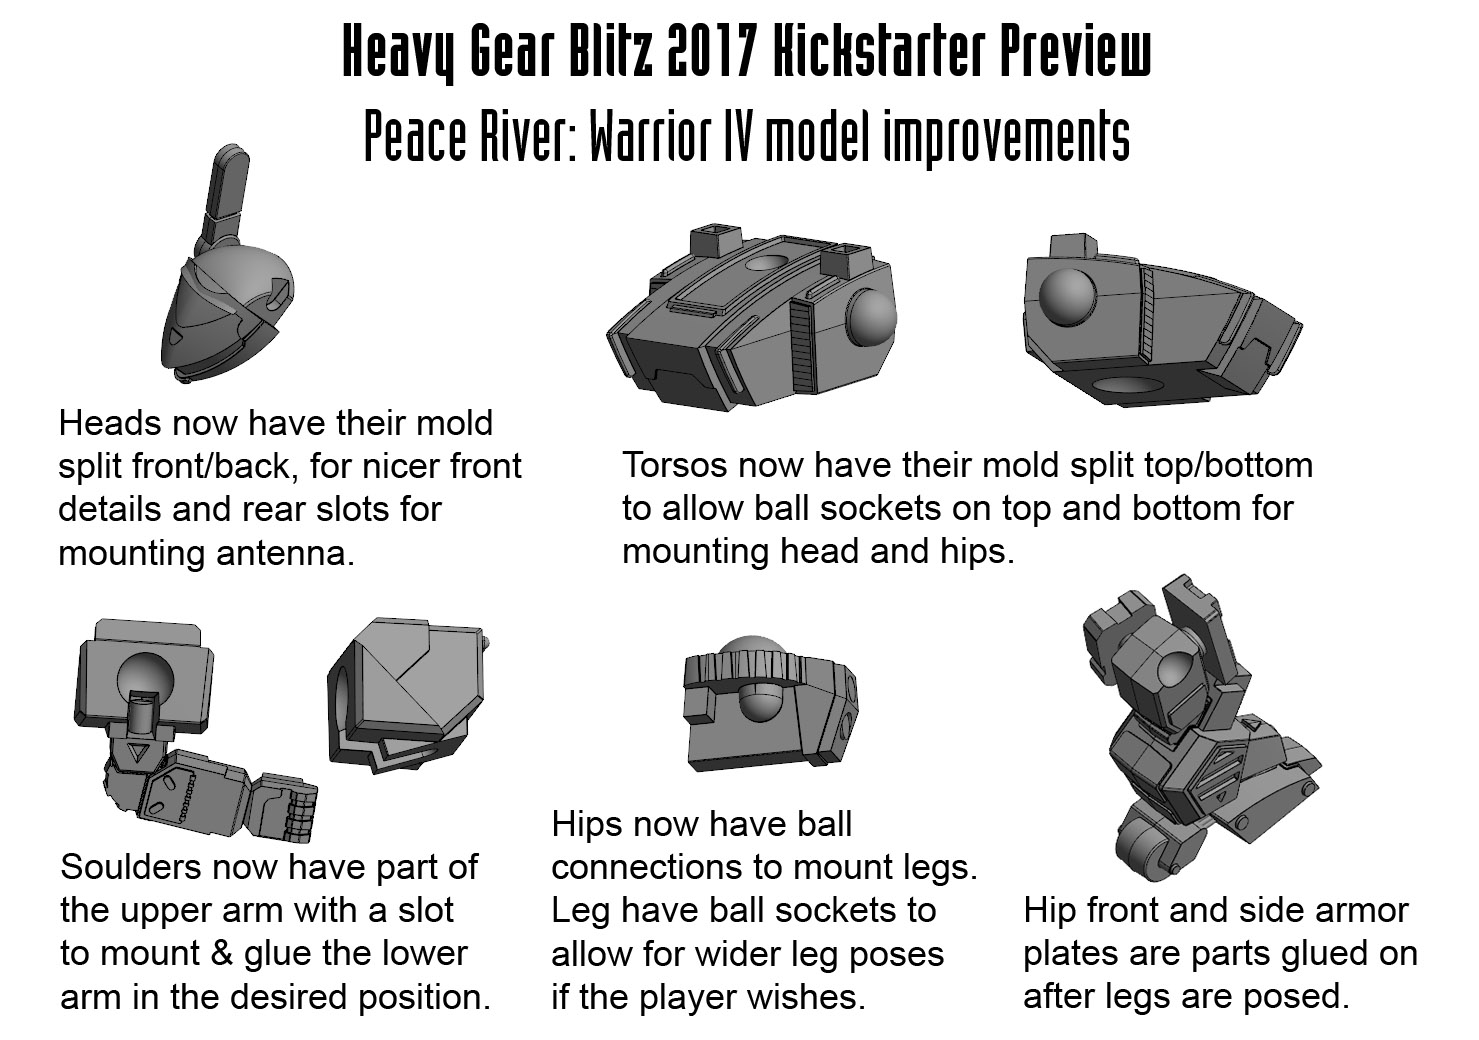 Dream Pod 9: Heavy Gear Blitz 2017 Kickstarter Preview